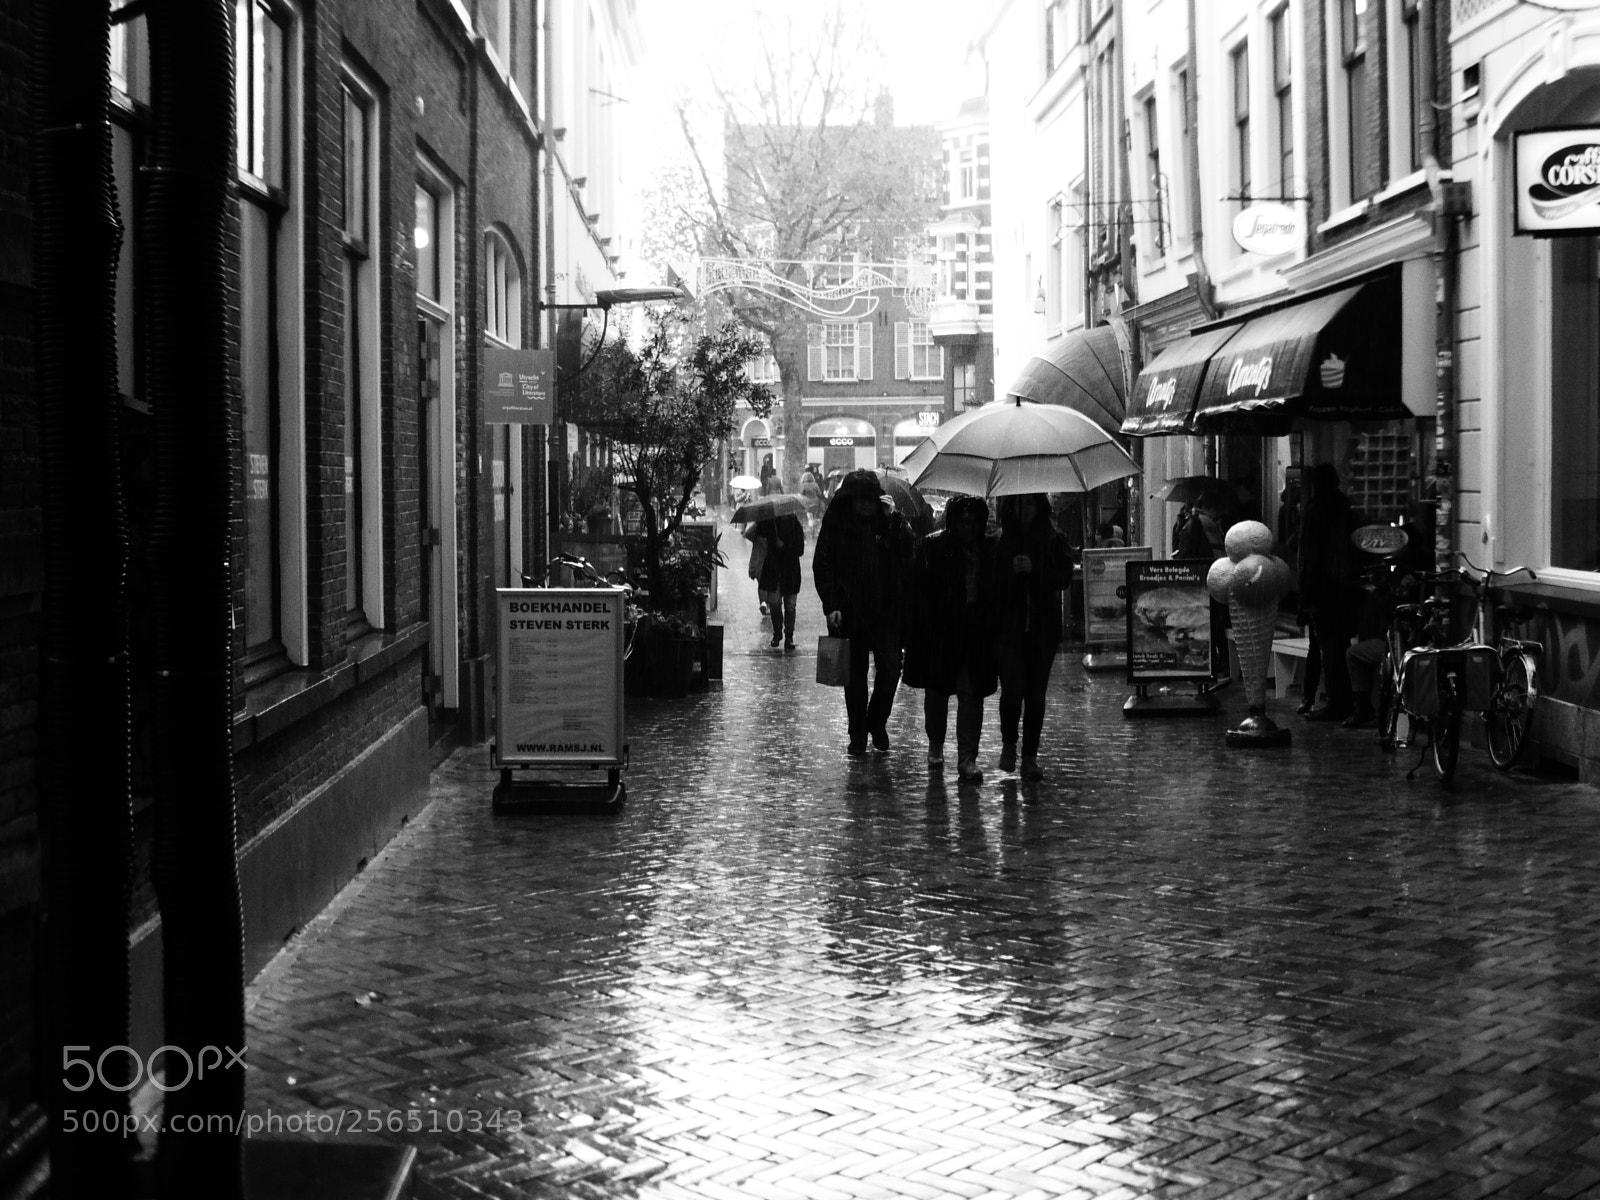 Raining photography